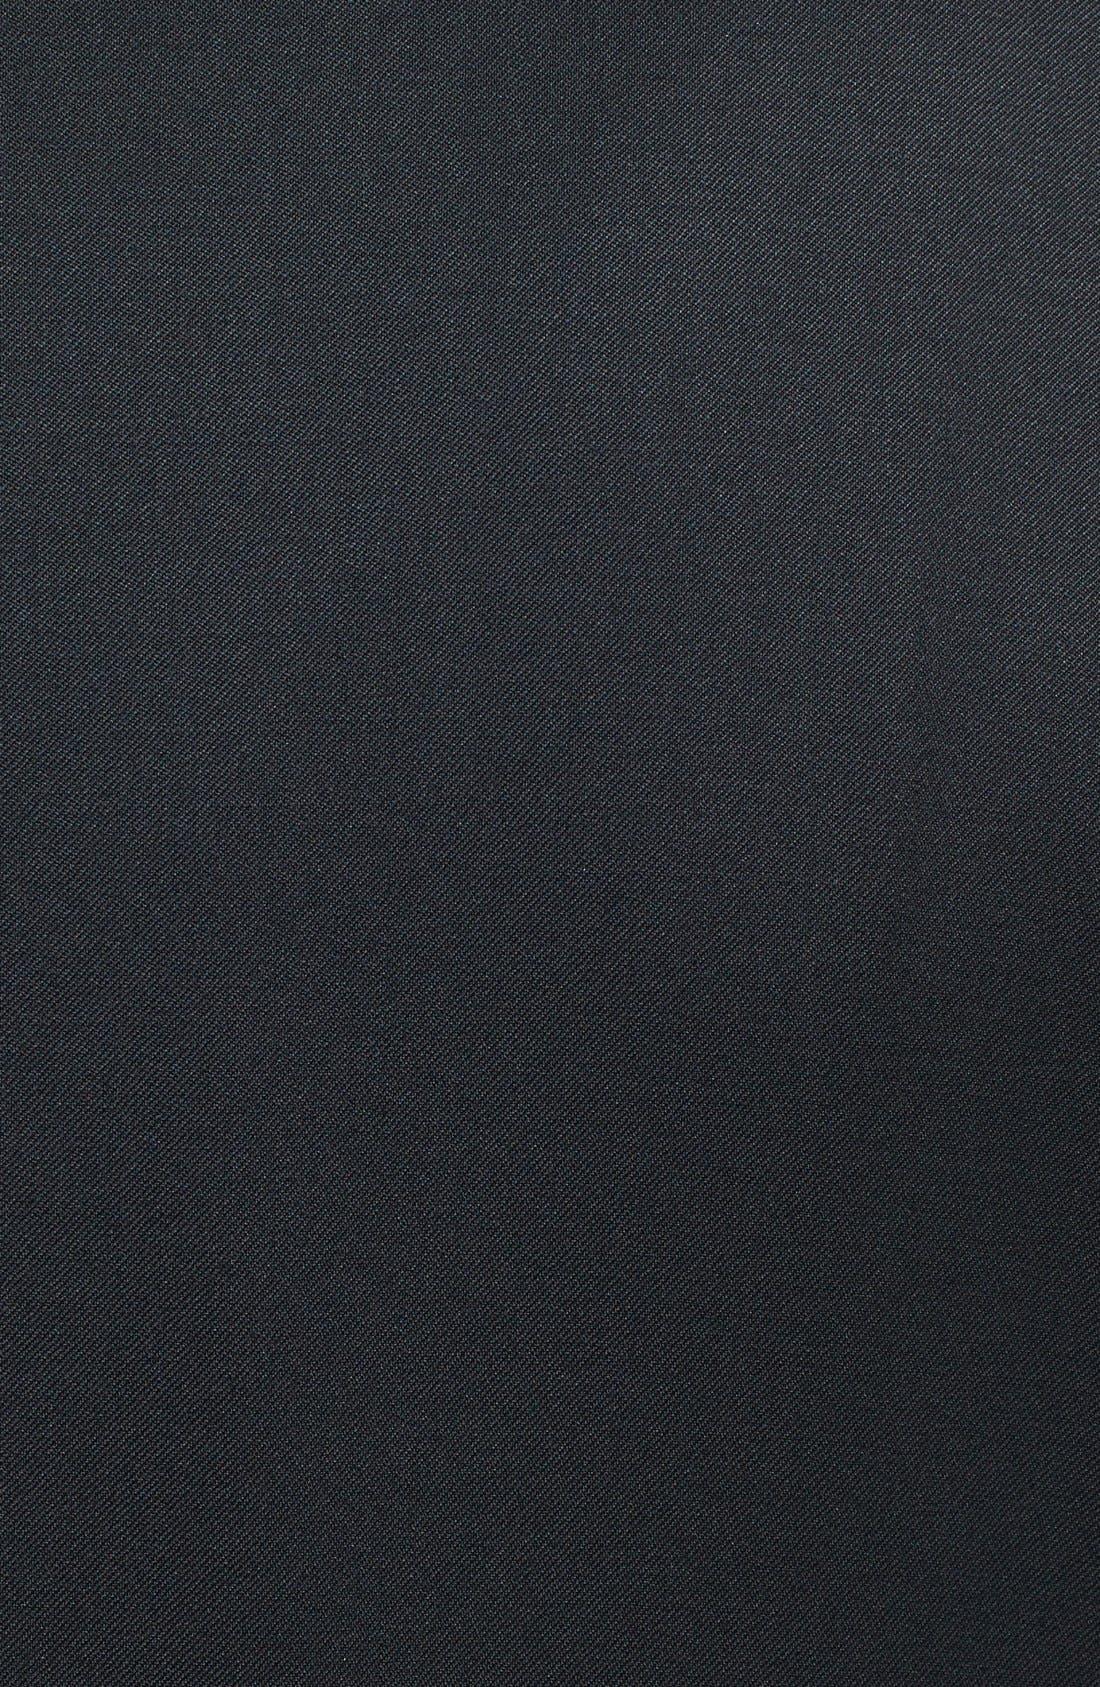 Russell Classic Fit Loro Piana Wool Tuxedo,                             Alternate thumbnail 8, color,                             BLACK